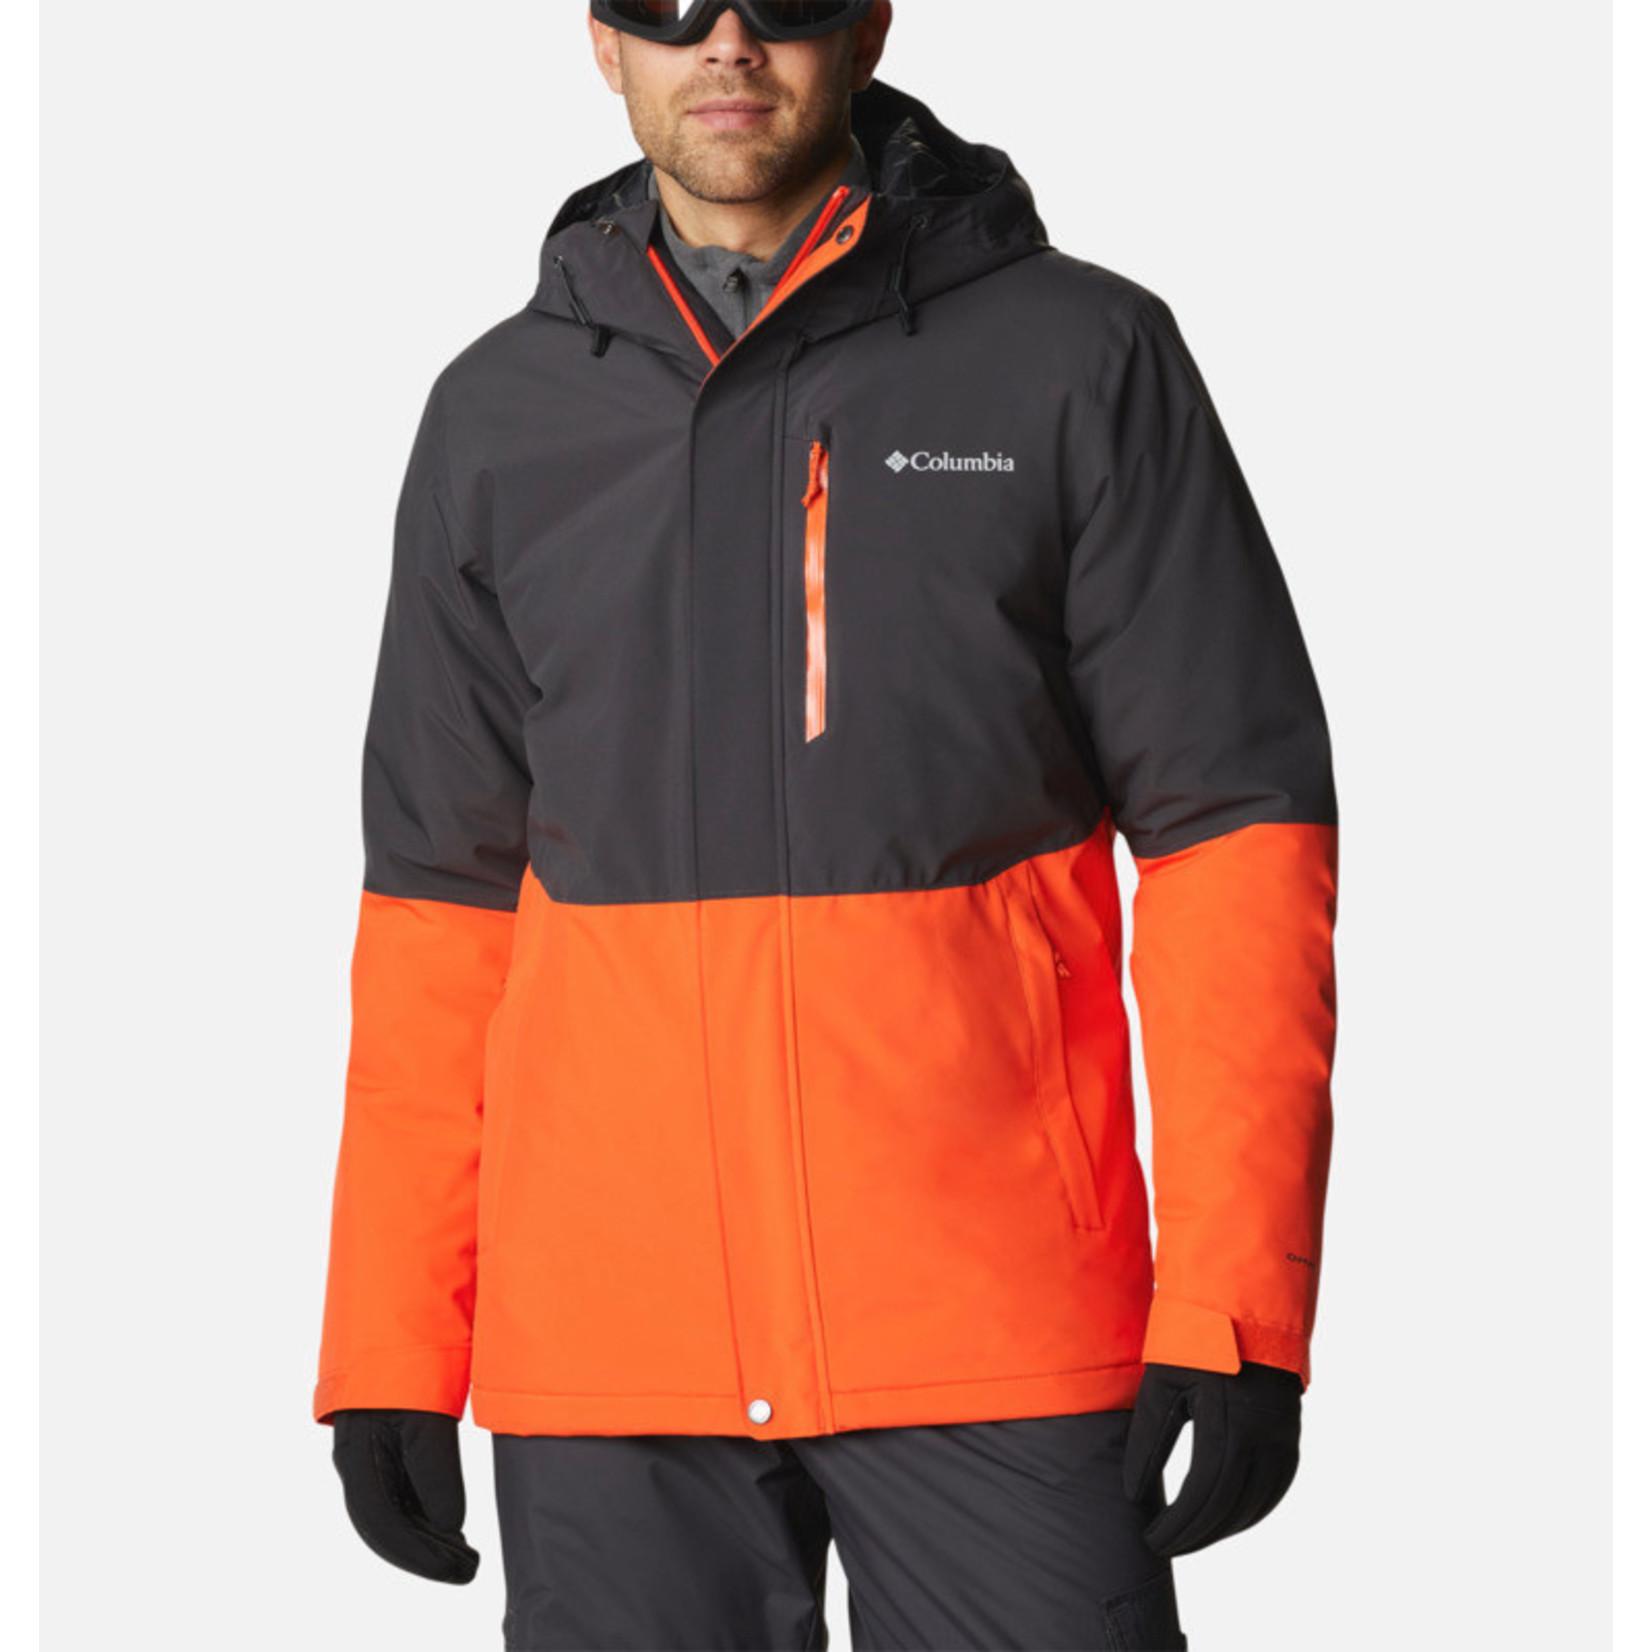 Columbia Columbia Winter Jacket, Winter District, Mens